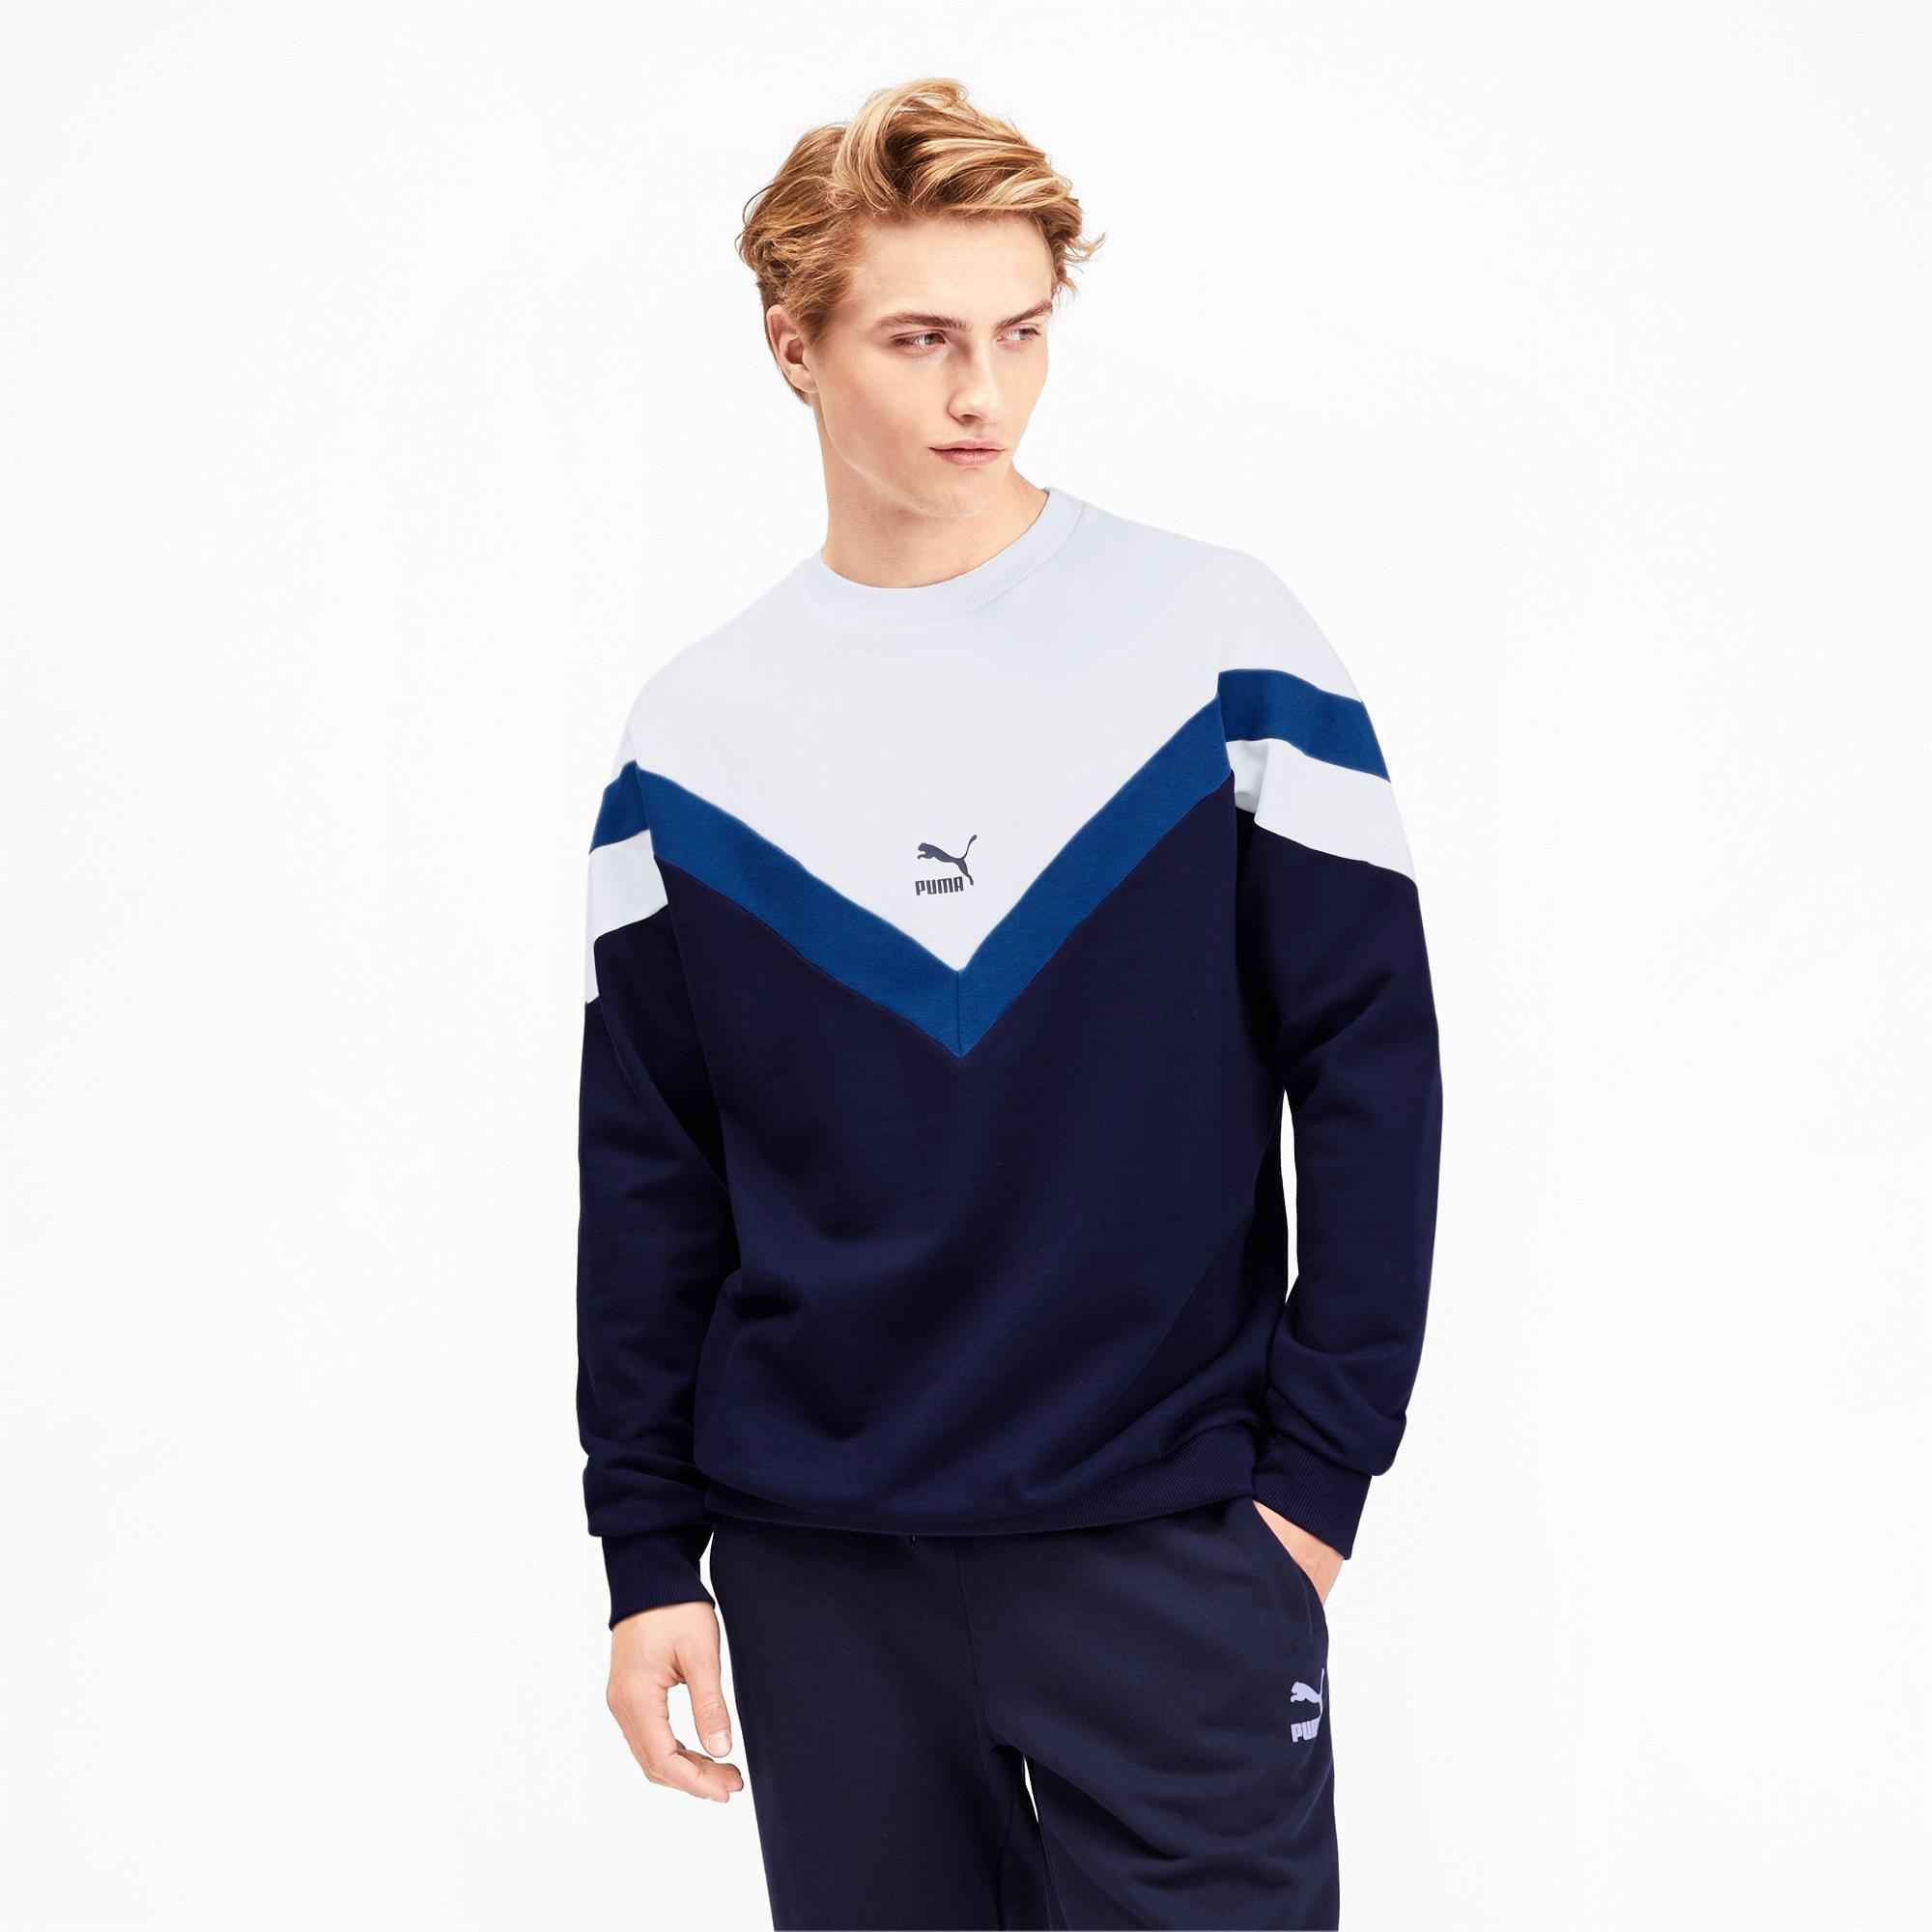 Thumbnail 2 of Iconic MCS Crew Men's Sweater, Peacoat, medium